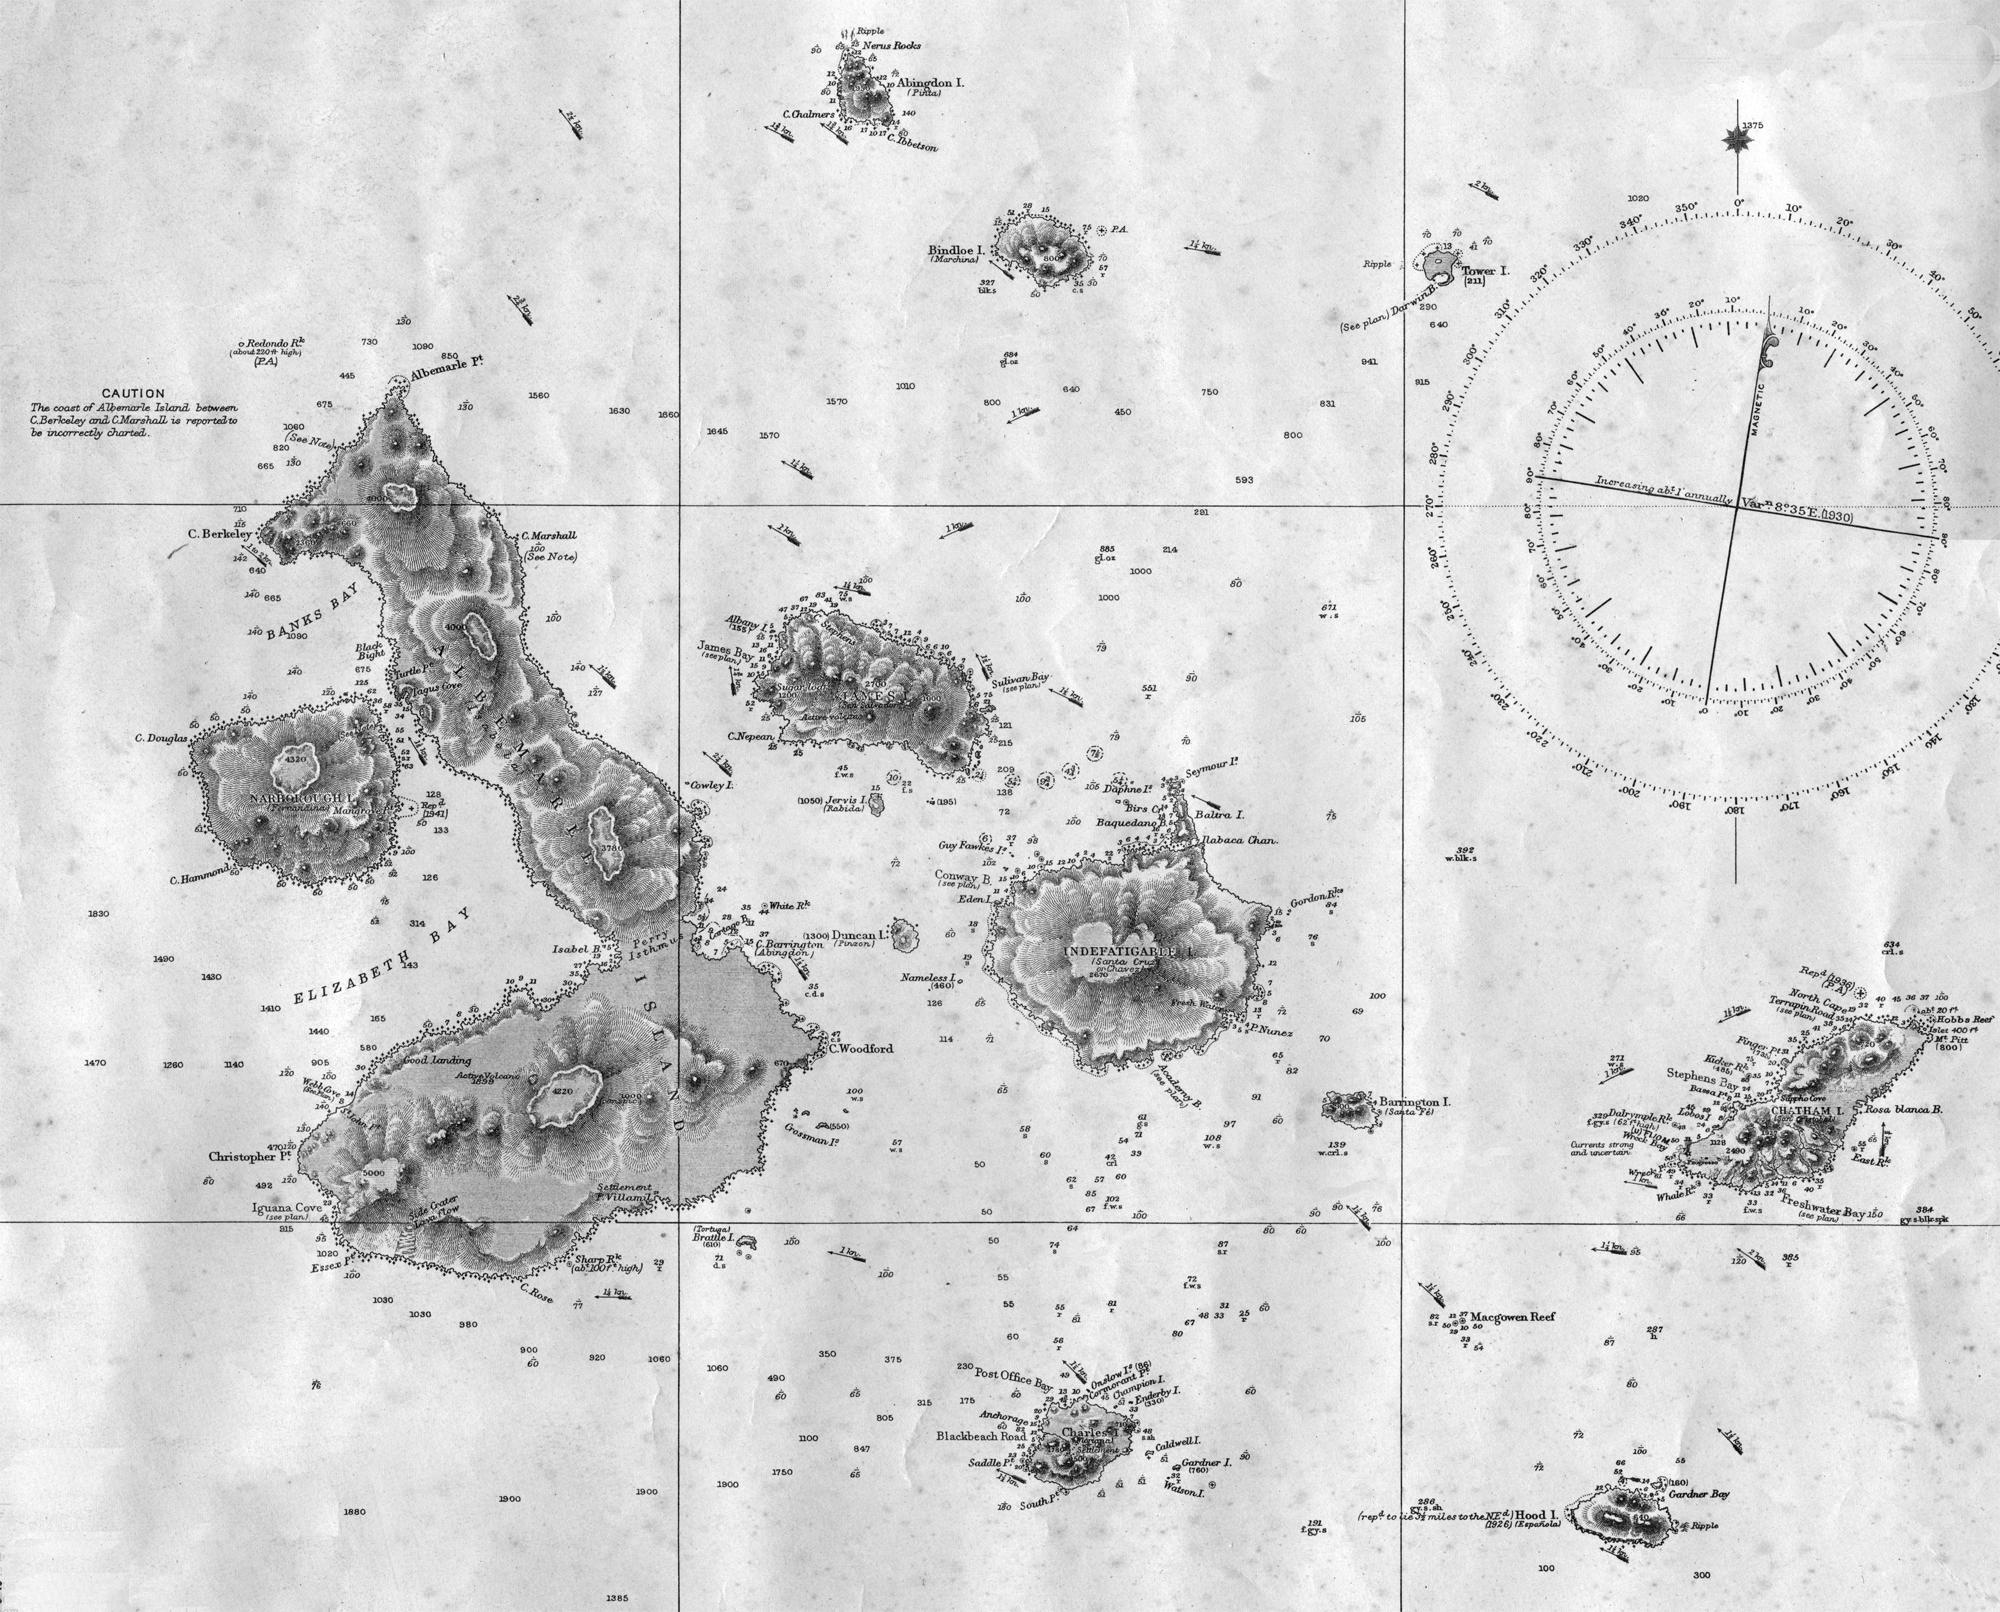 1024px-Galapagos_1836.jpg